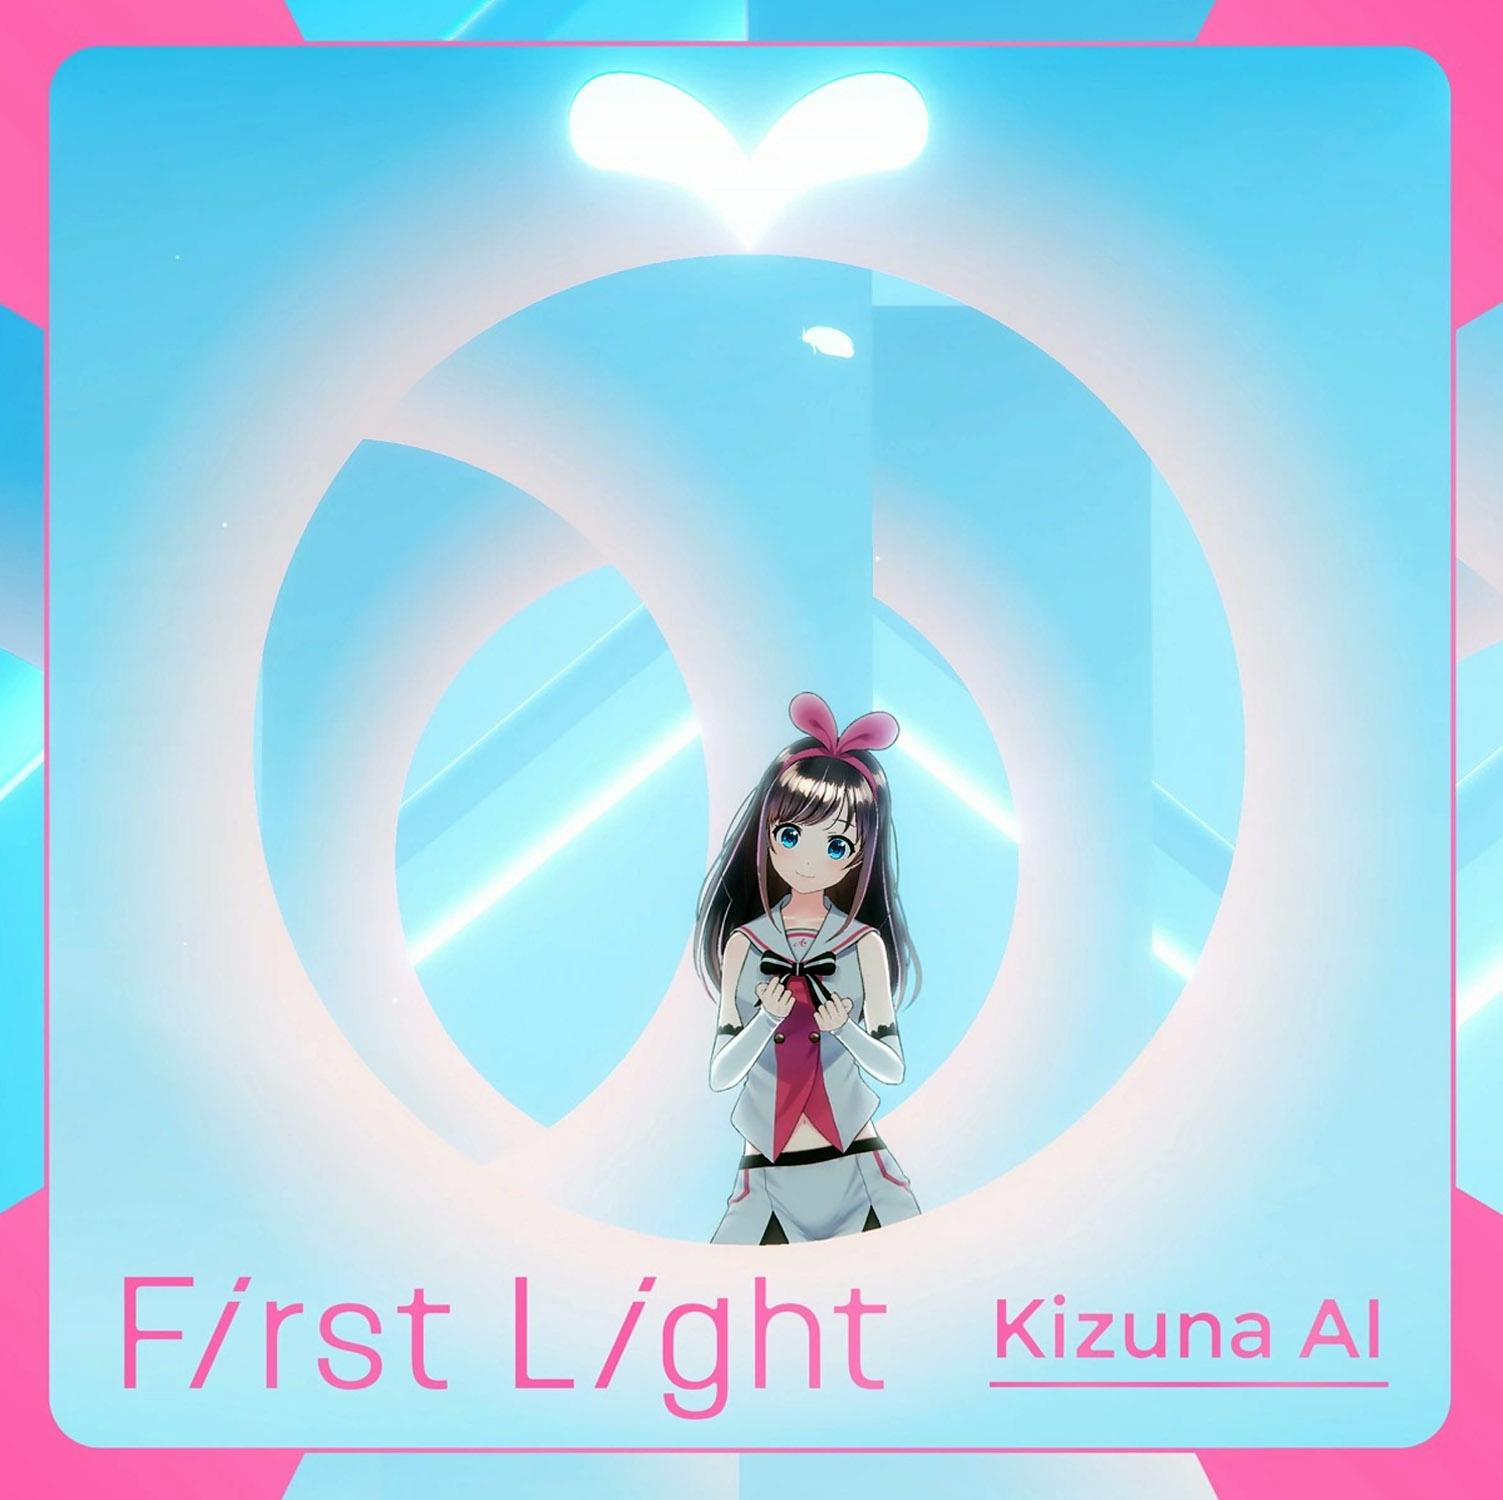 Kizuna AI - First Light